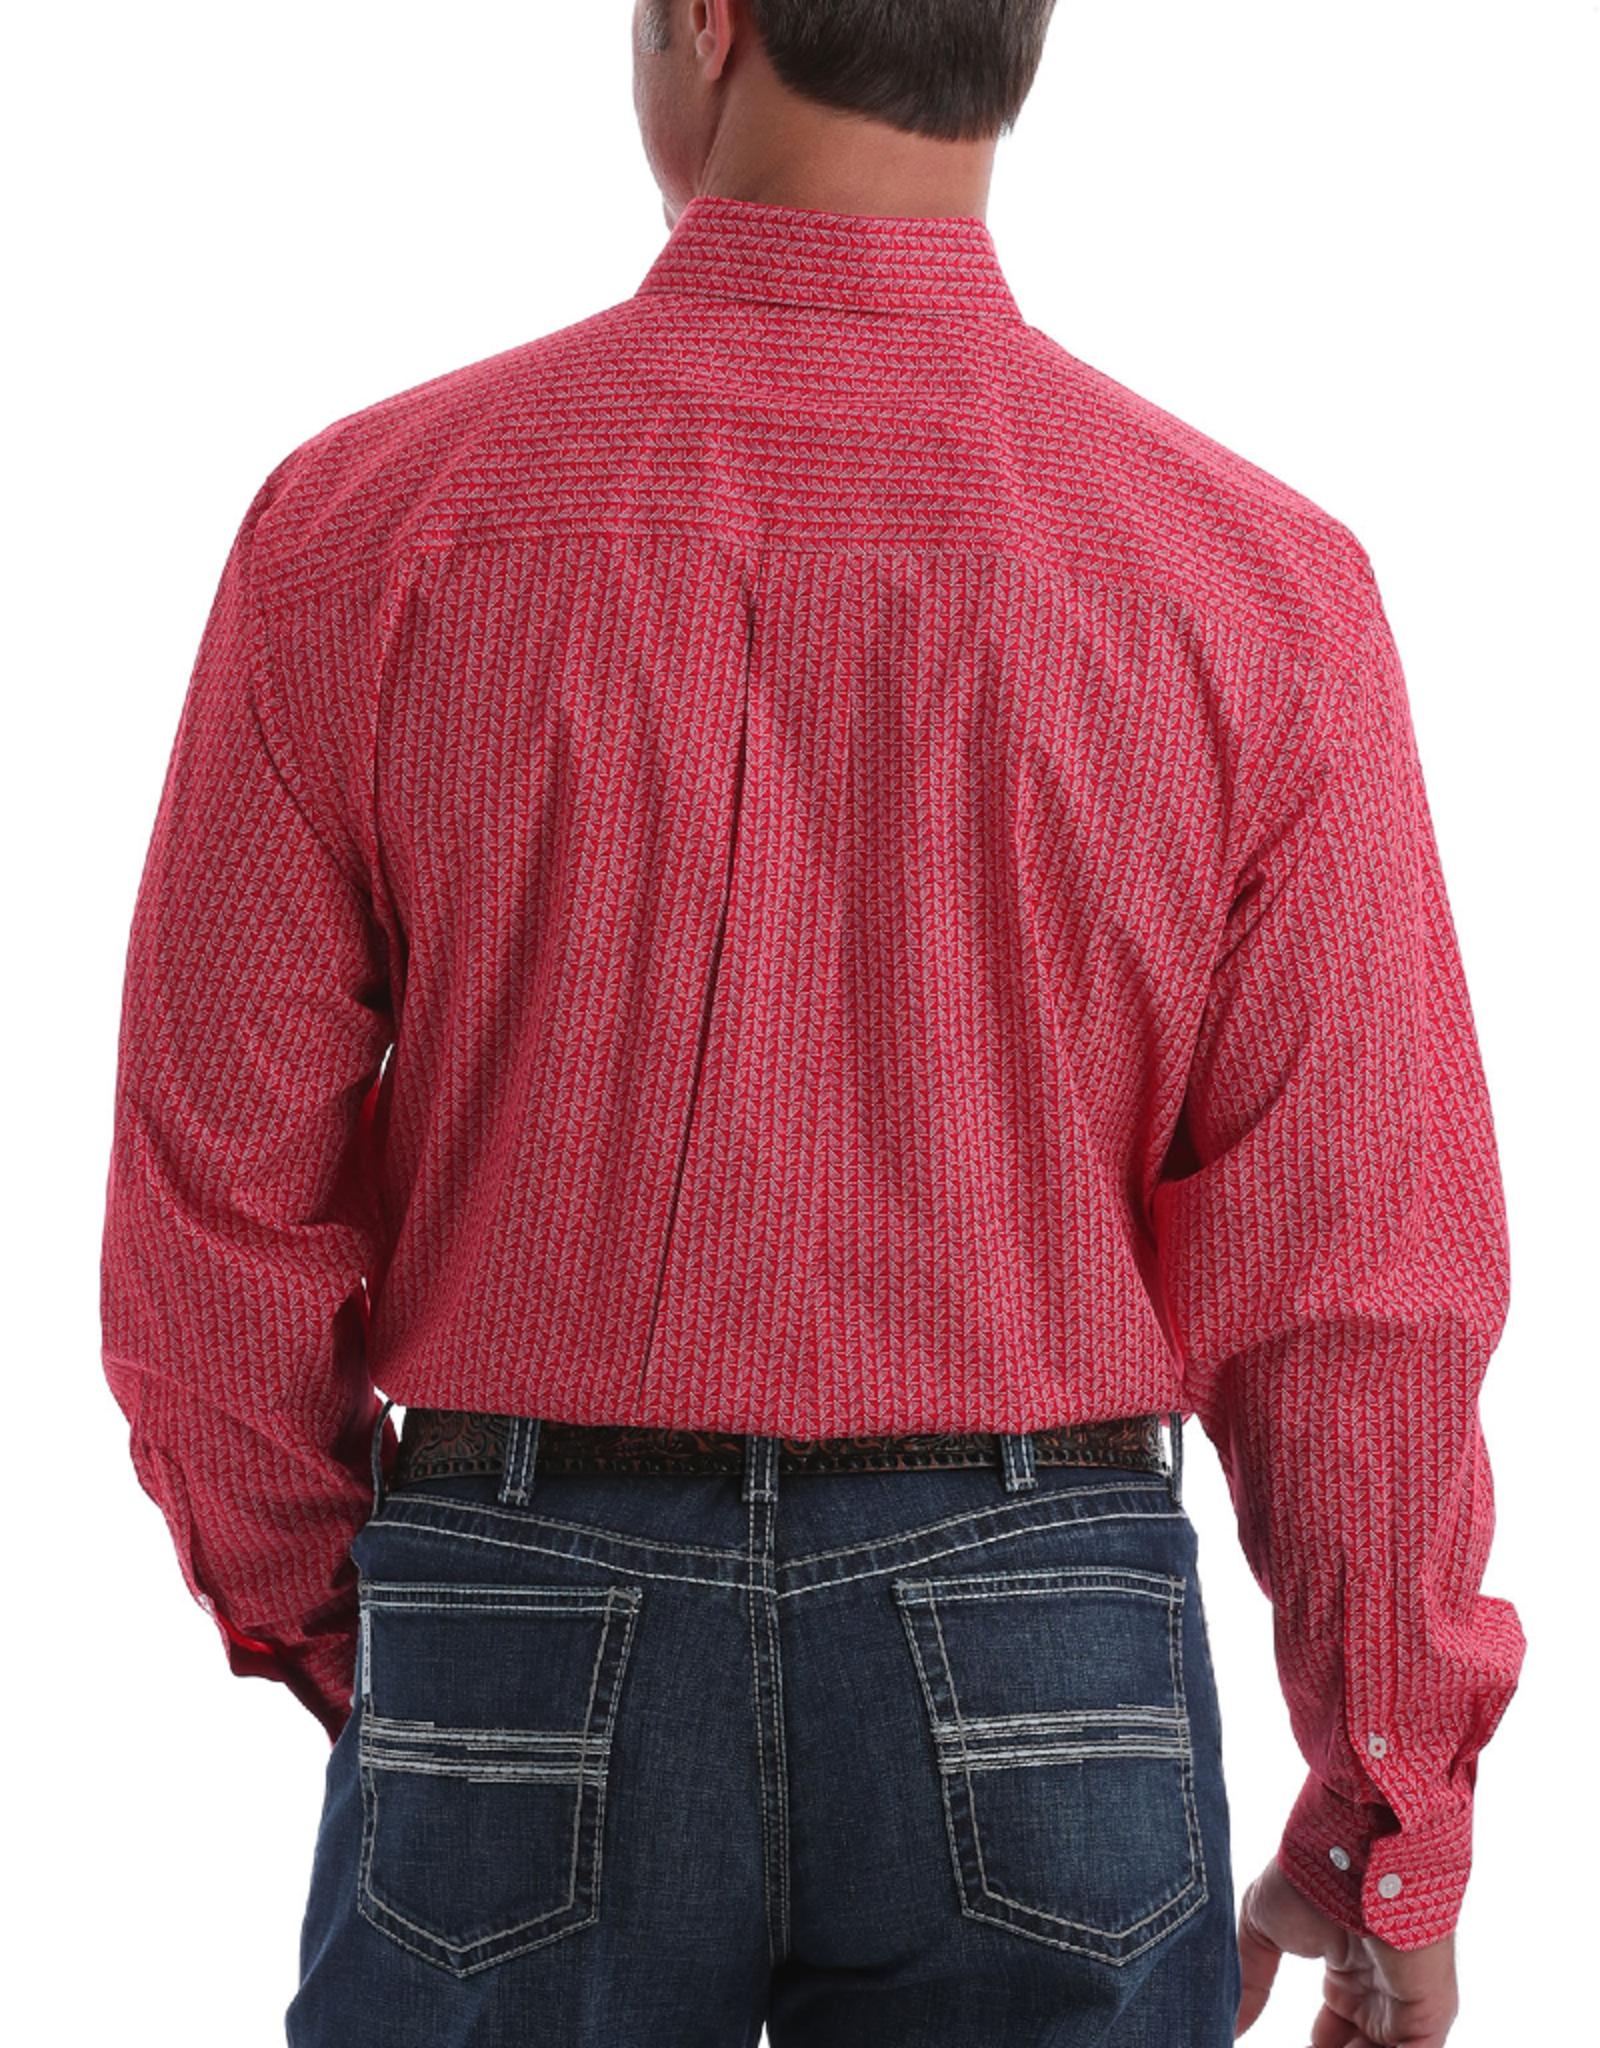 Cinch Cinch Classic Fit Stretch Print Shirt